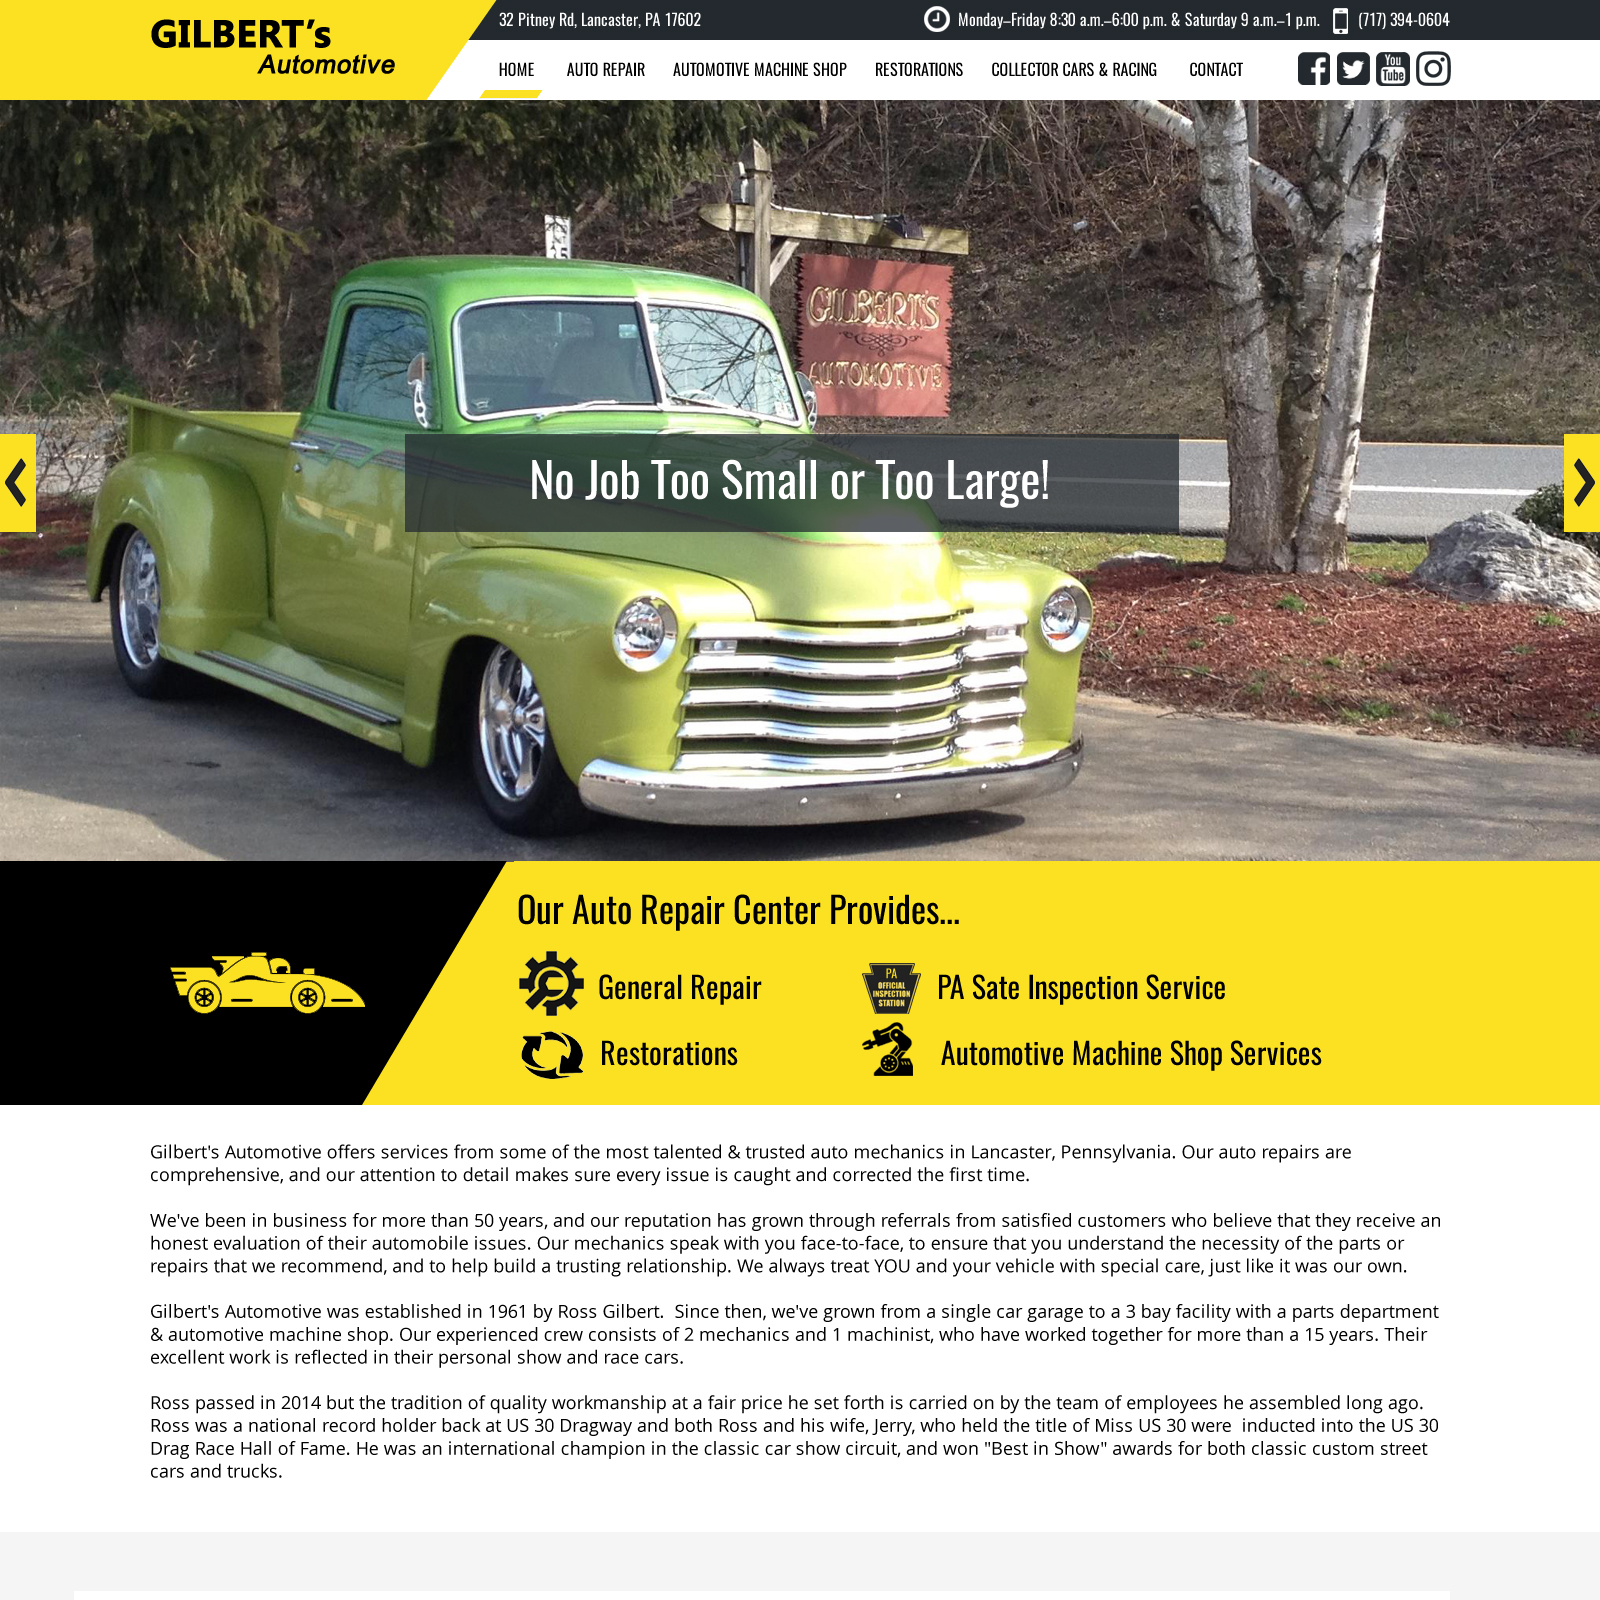 Gilberts Automobile Auto Repair Center Website Design